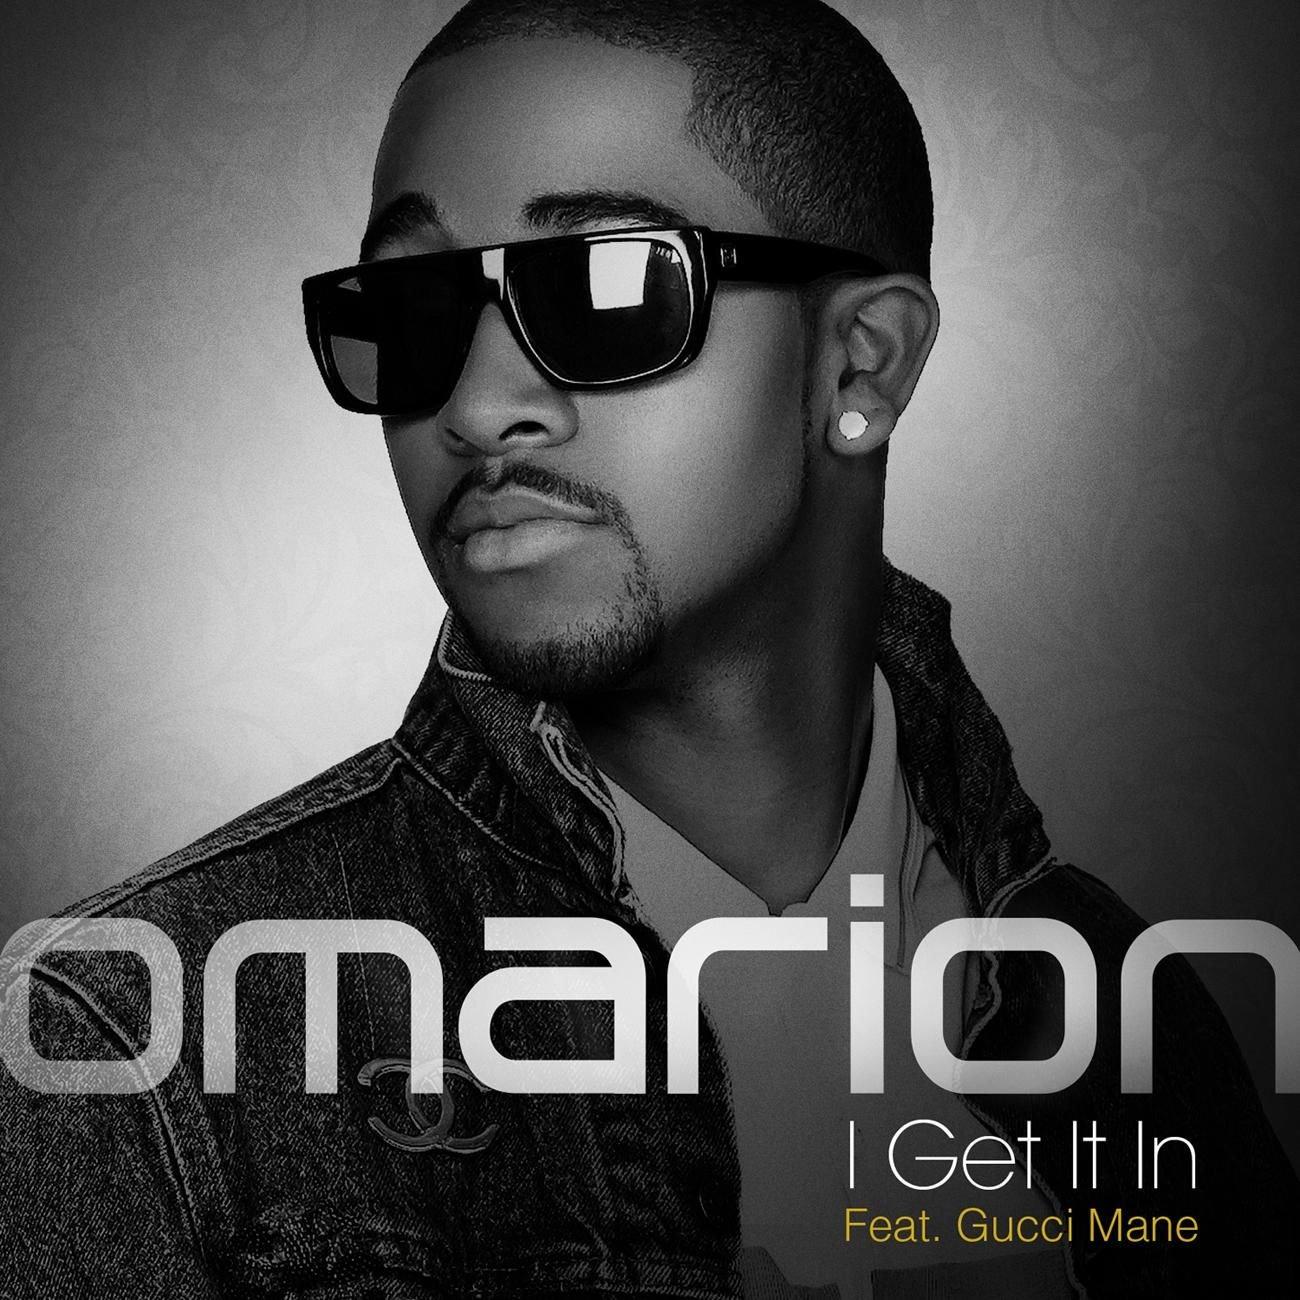 Omarion album I Get It In featuring Gucci Mane